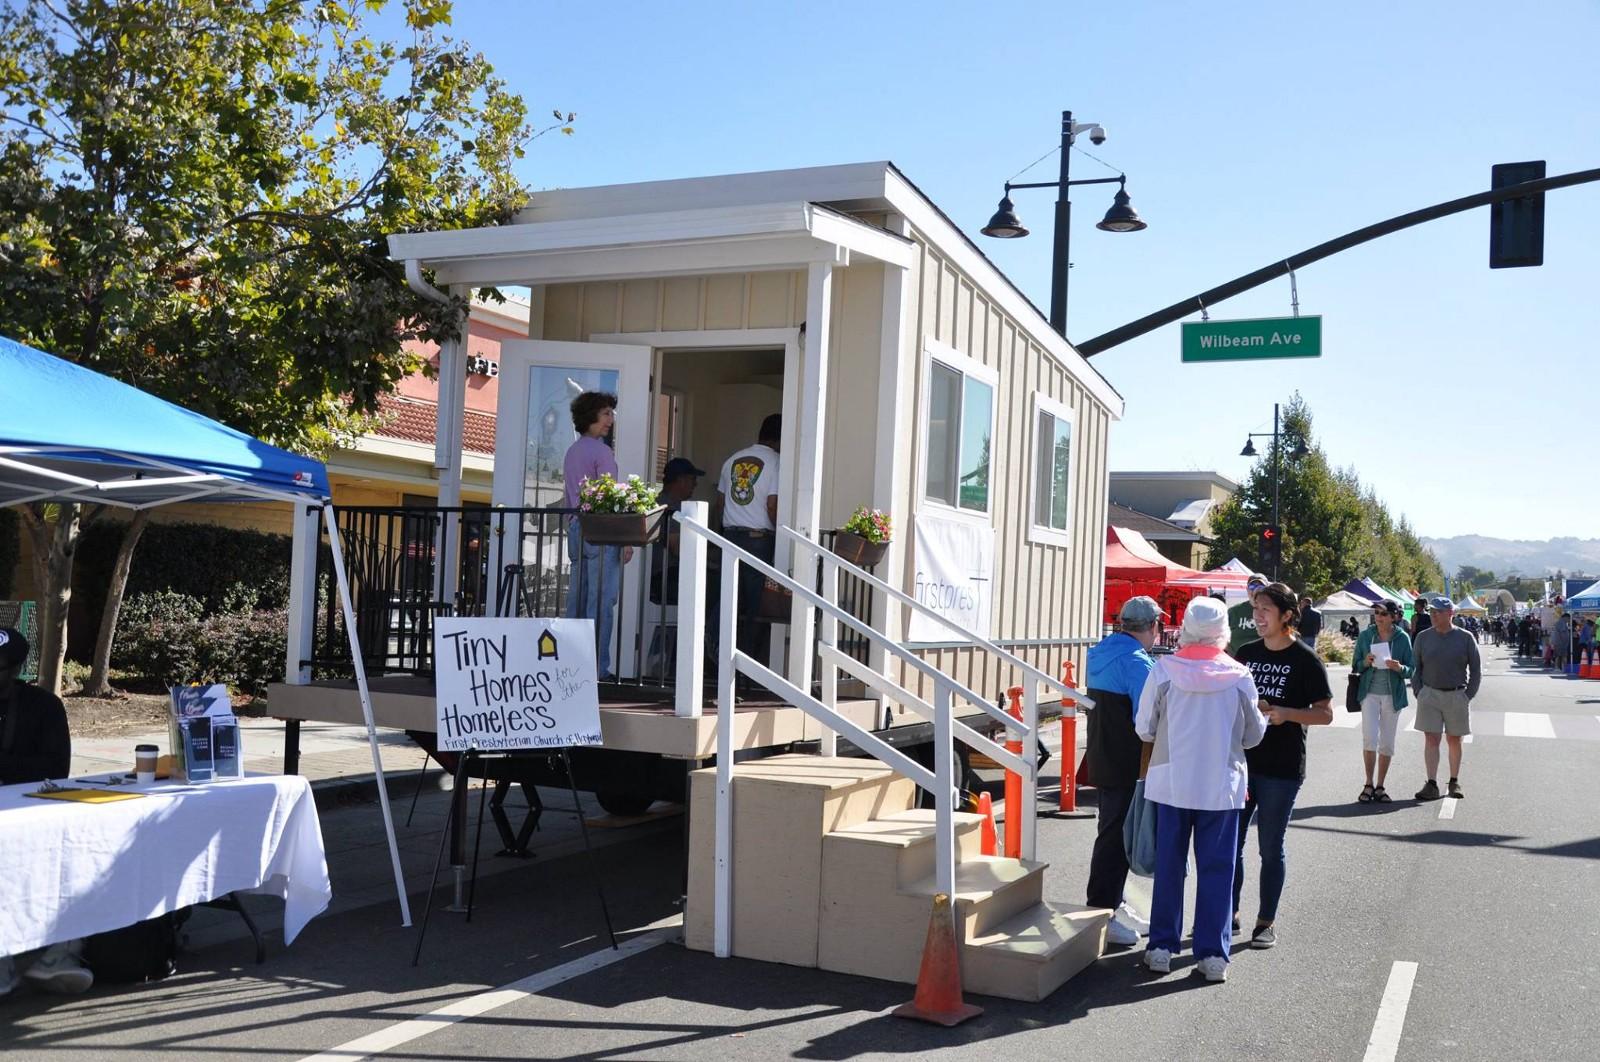 Tiny Homes Demo at Castro Valley Fall Festival 2018